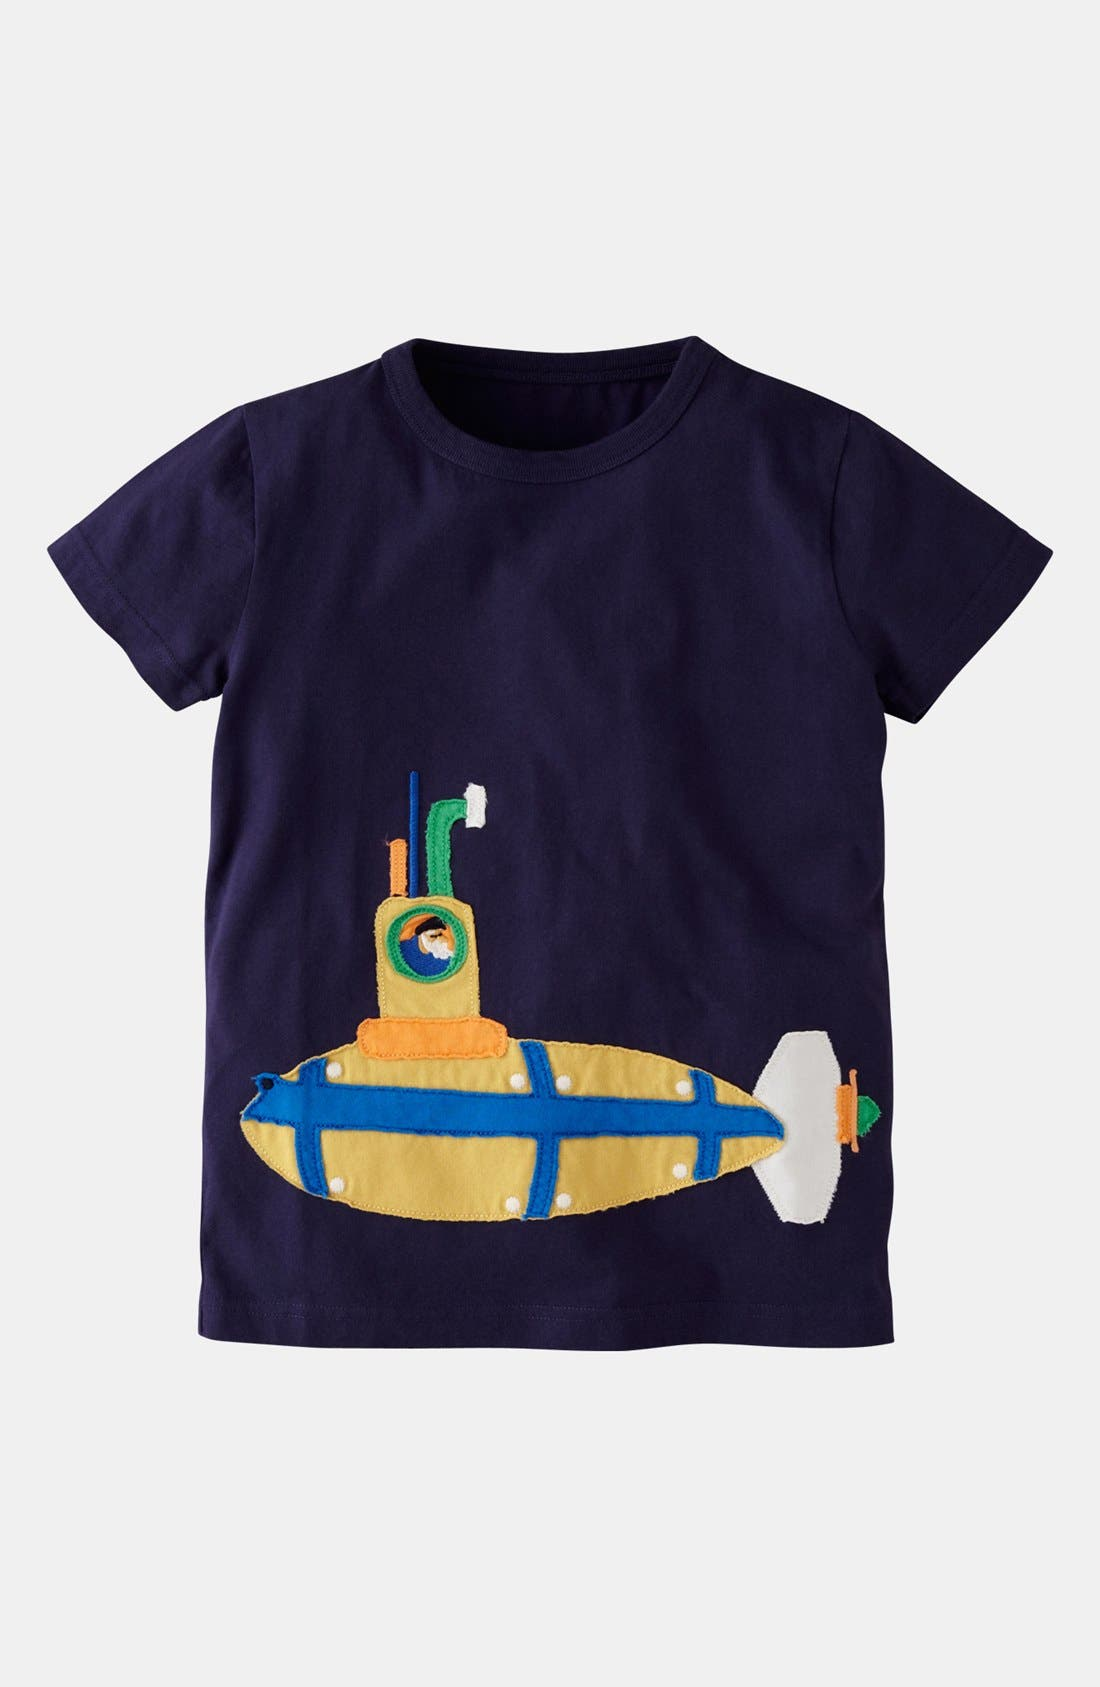 Alternate Image 1 Selected - Mini Boden 'Vehicle' T-Shirt (Little Boys & Big Boys)